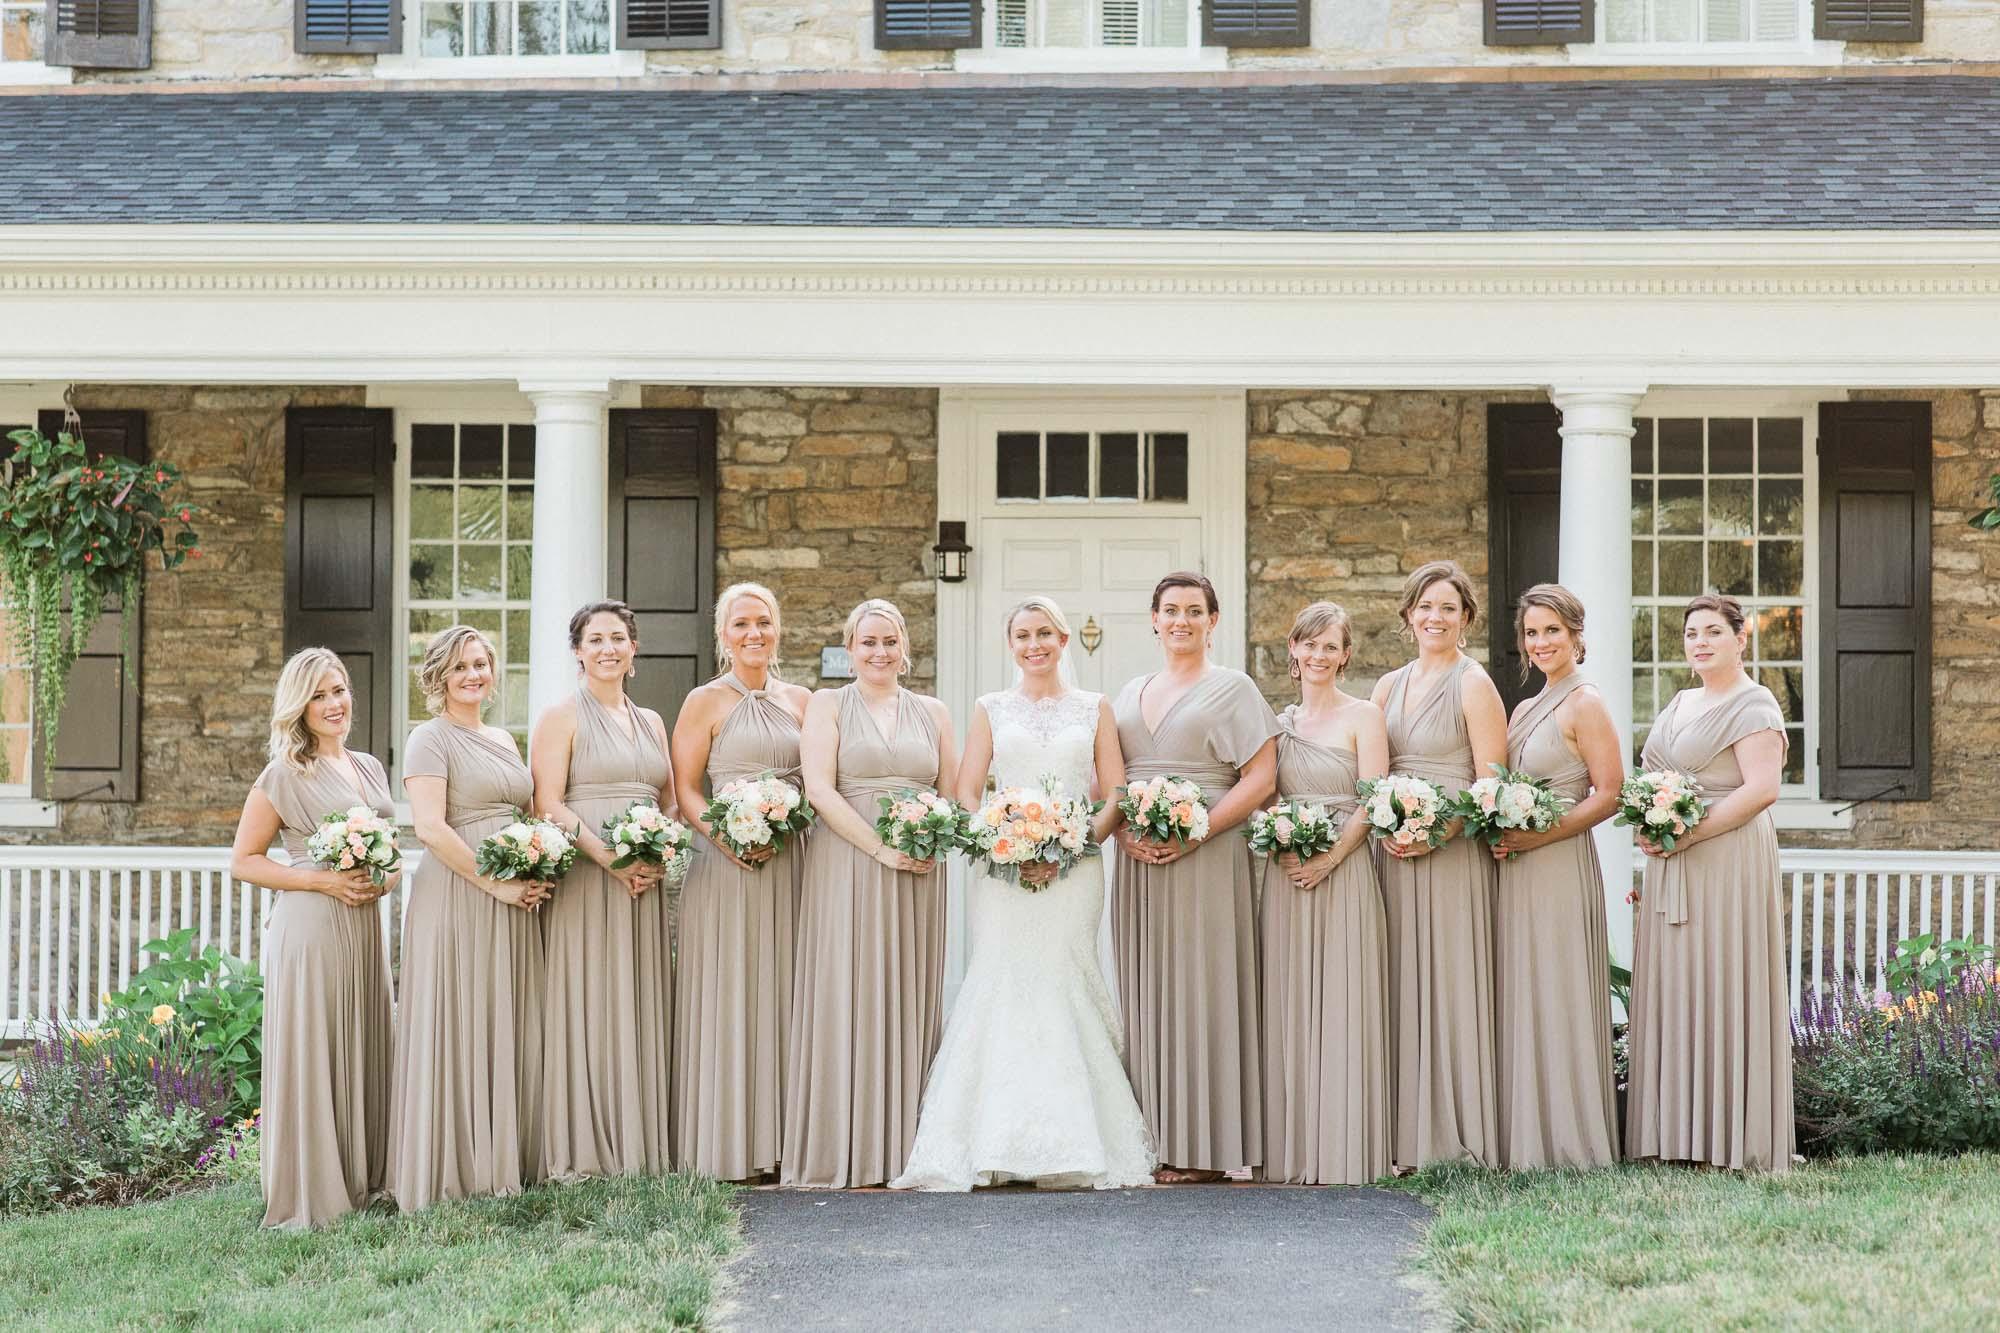 Allenberry-resort-historic-pennsylvania-wedding-22176.jpg